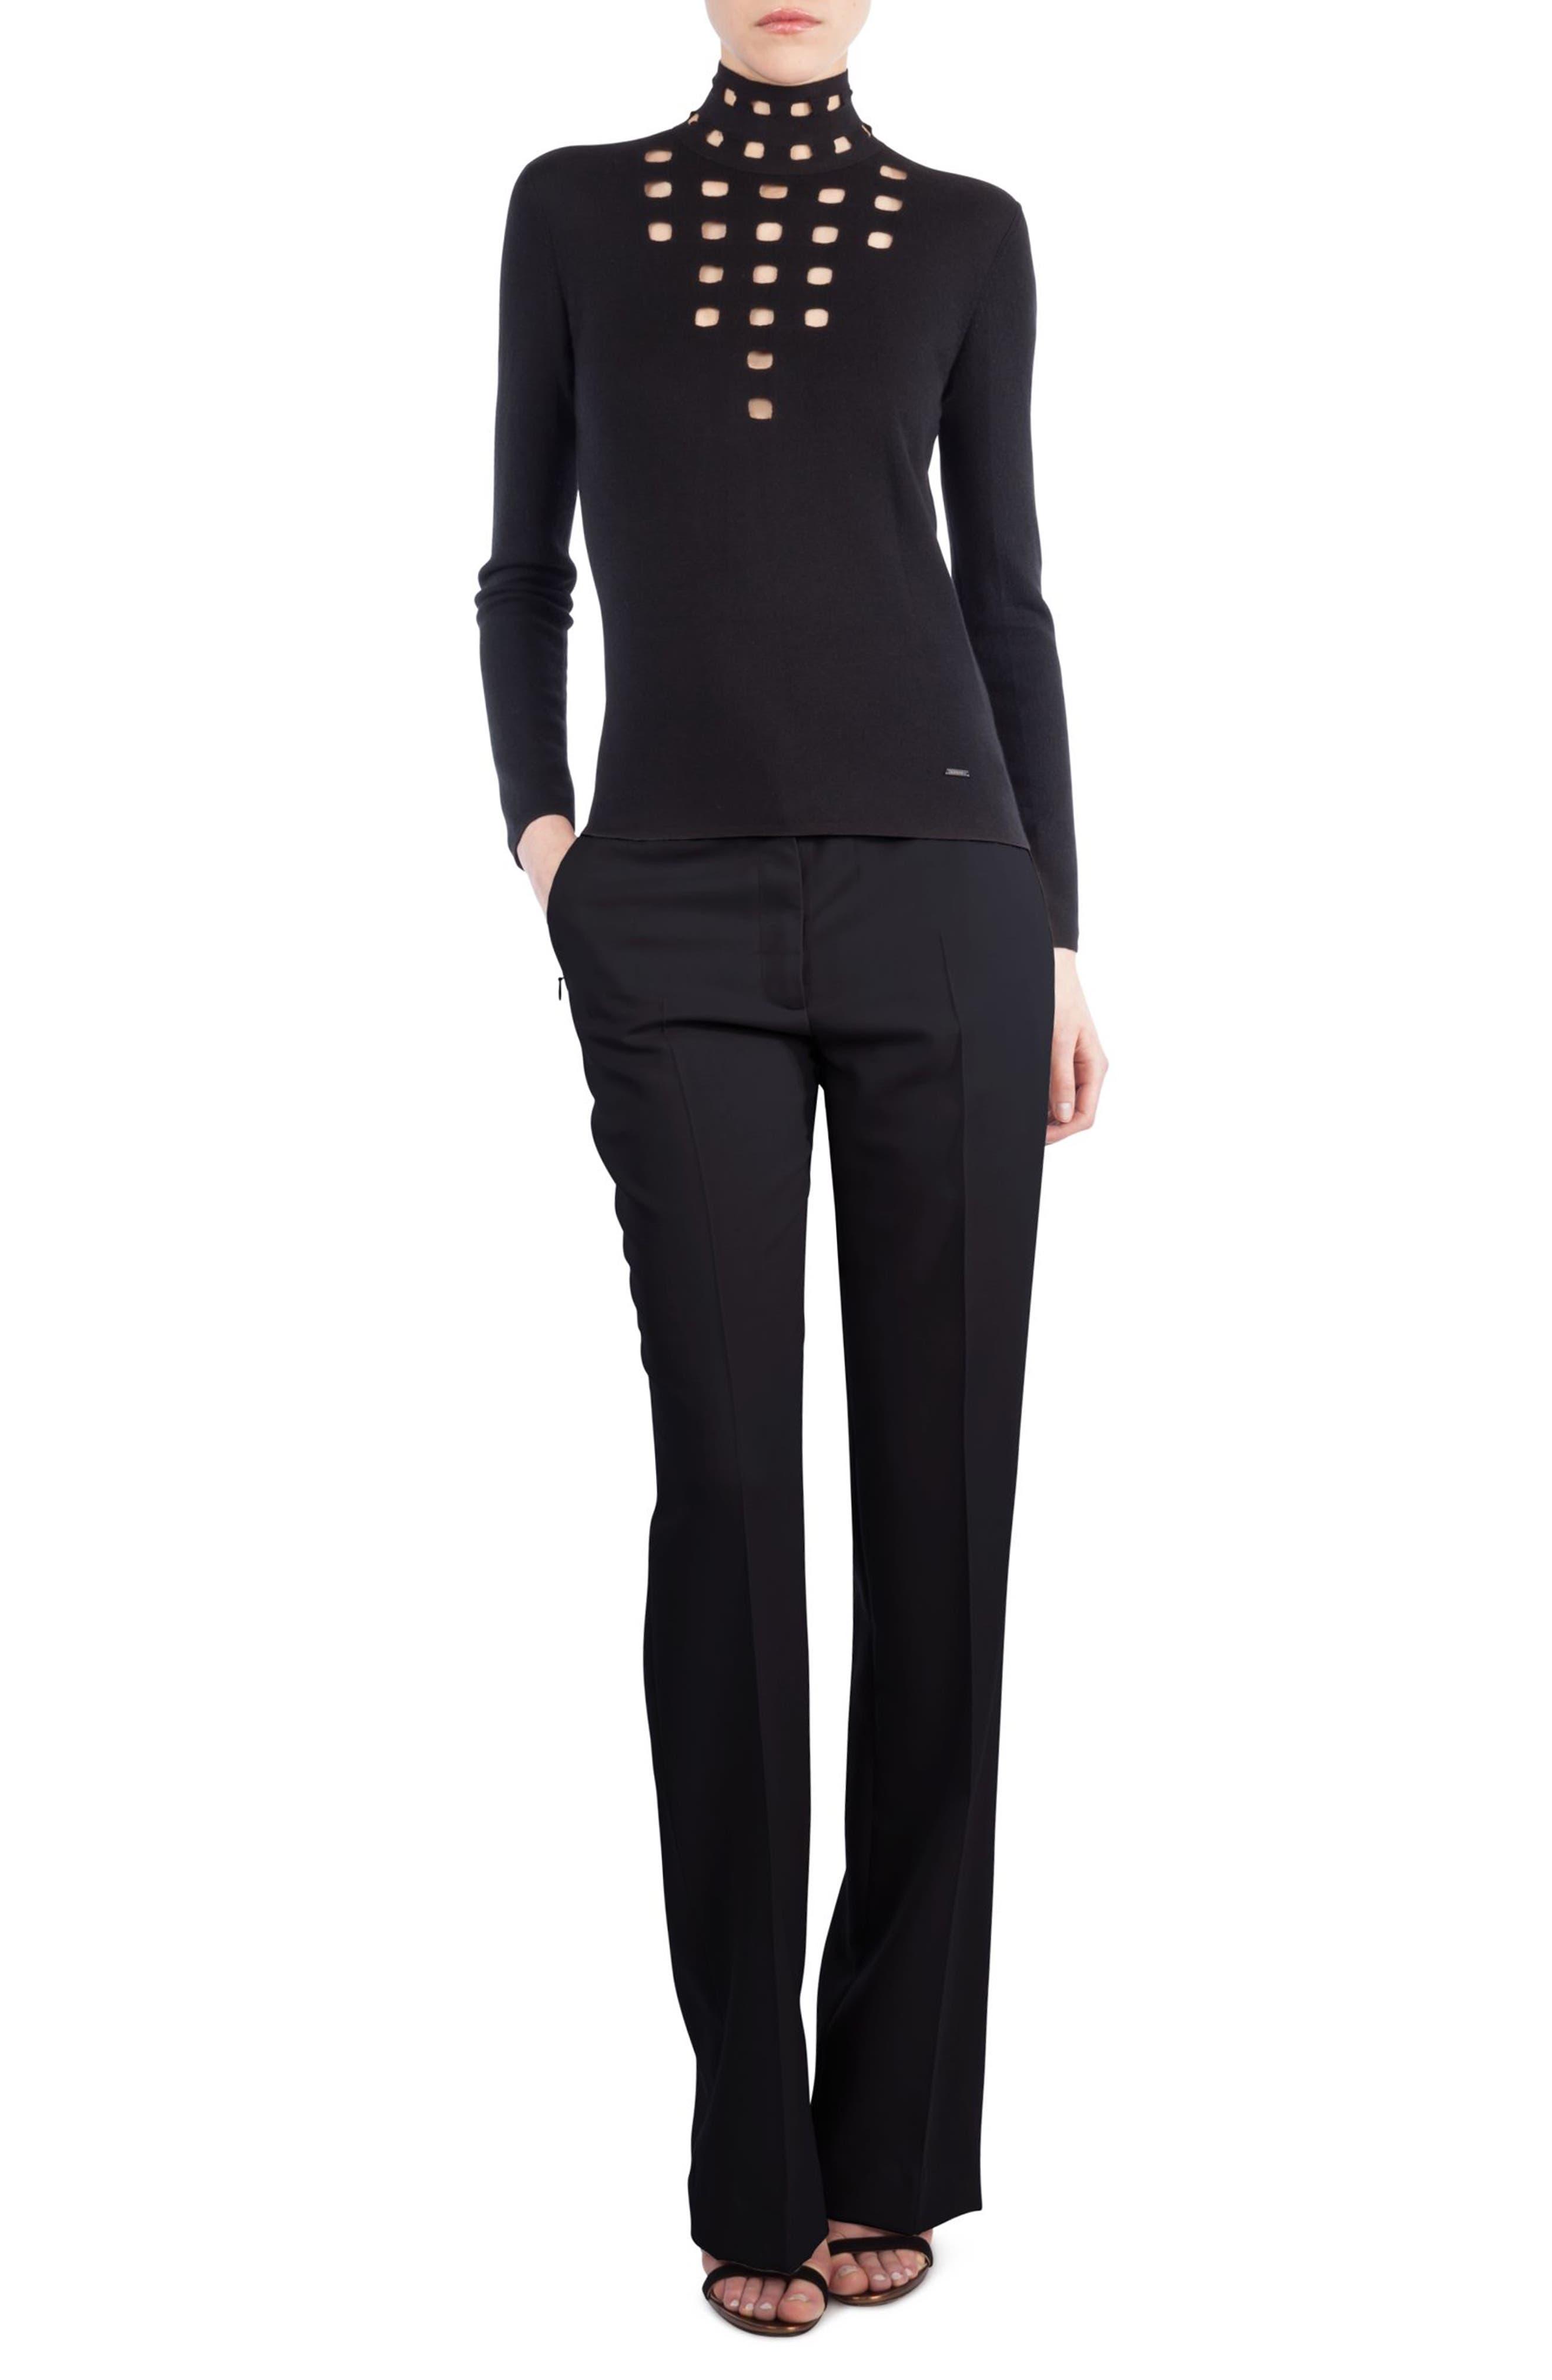 St. Gallen Cutout Cashmere & Silk Turtleneck Sweater,                         Main,                         color, Black